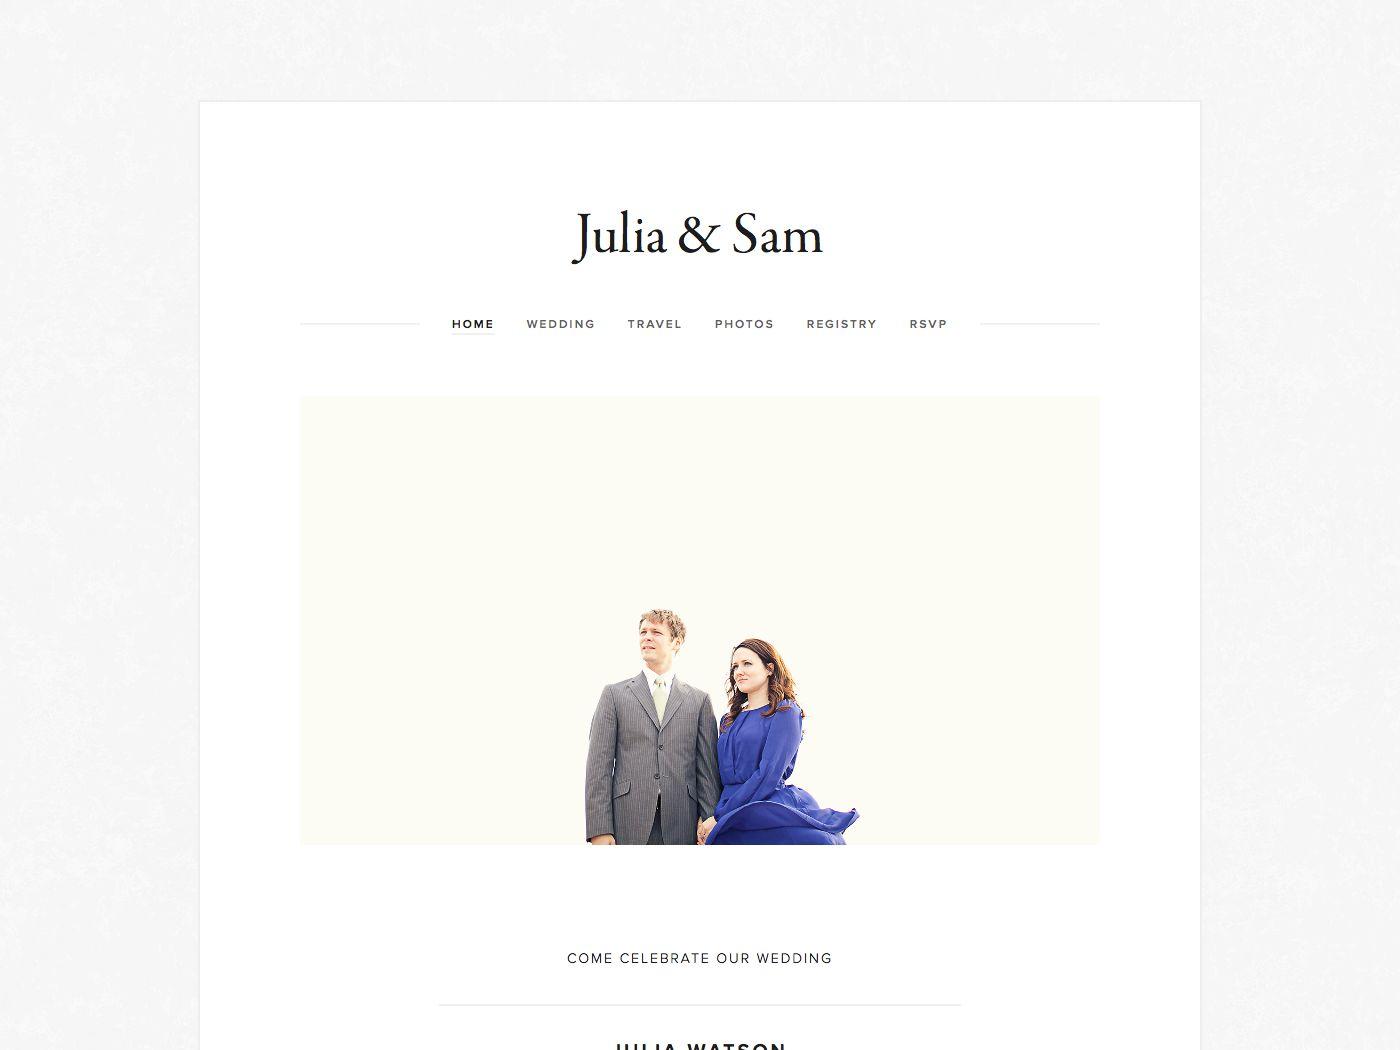 Julia template